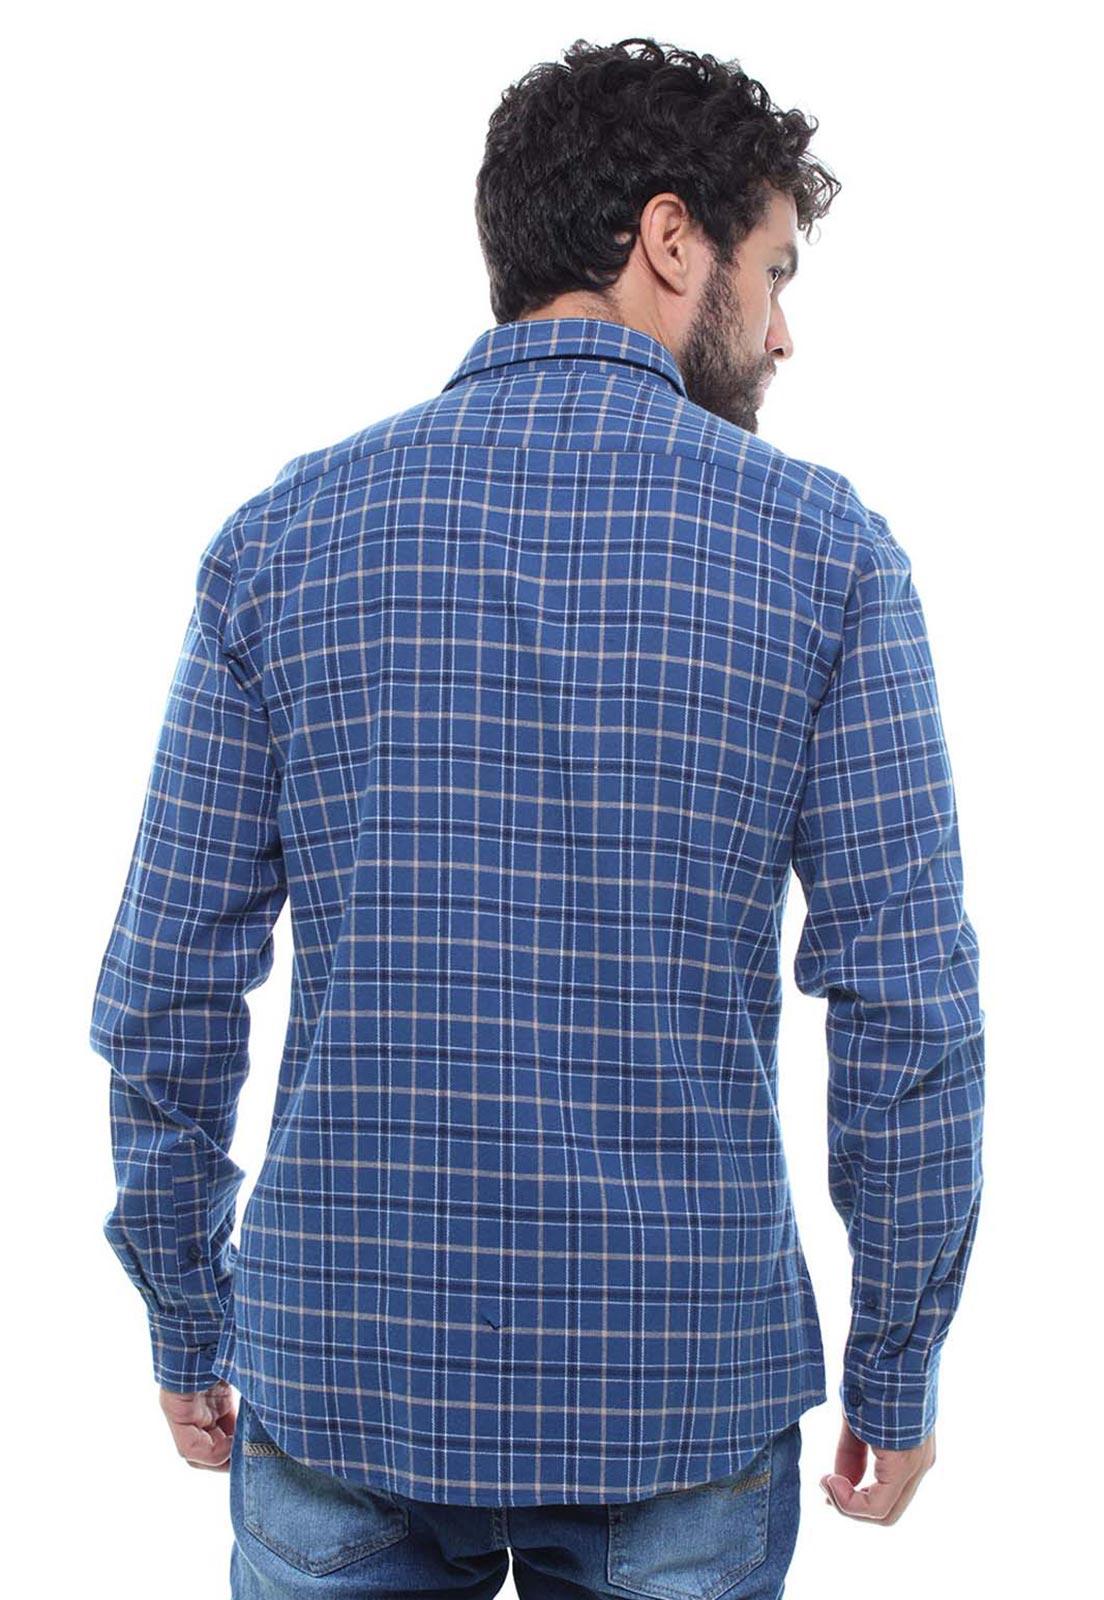 Camisa Xadrez Masculina Flanelada Manga Longa Crocker - 46888  - CROCKER JEANS